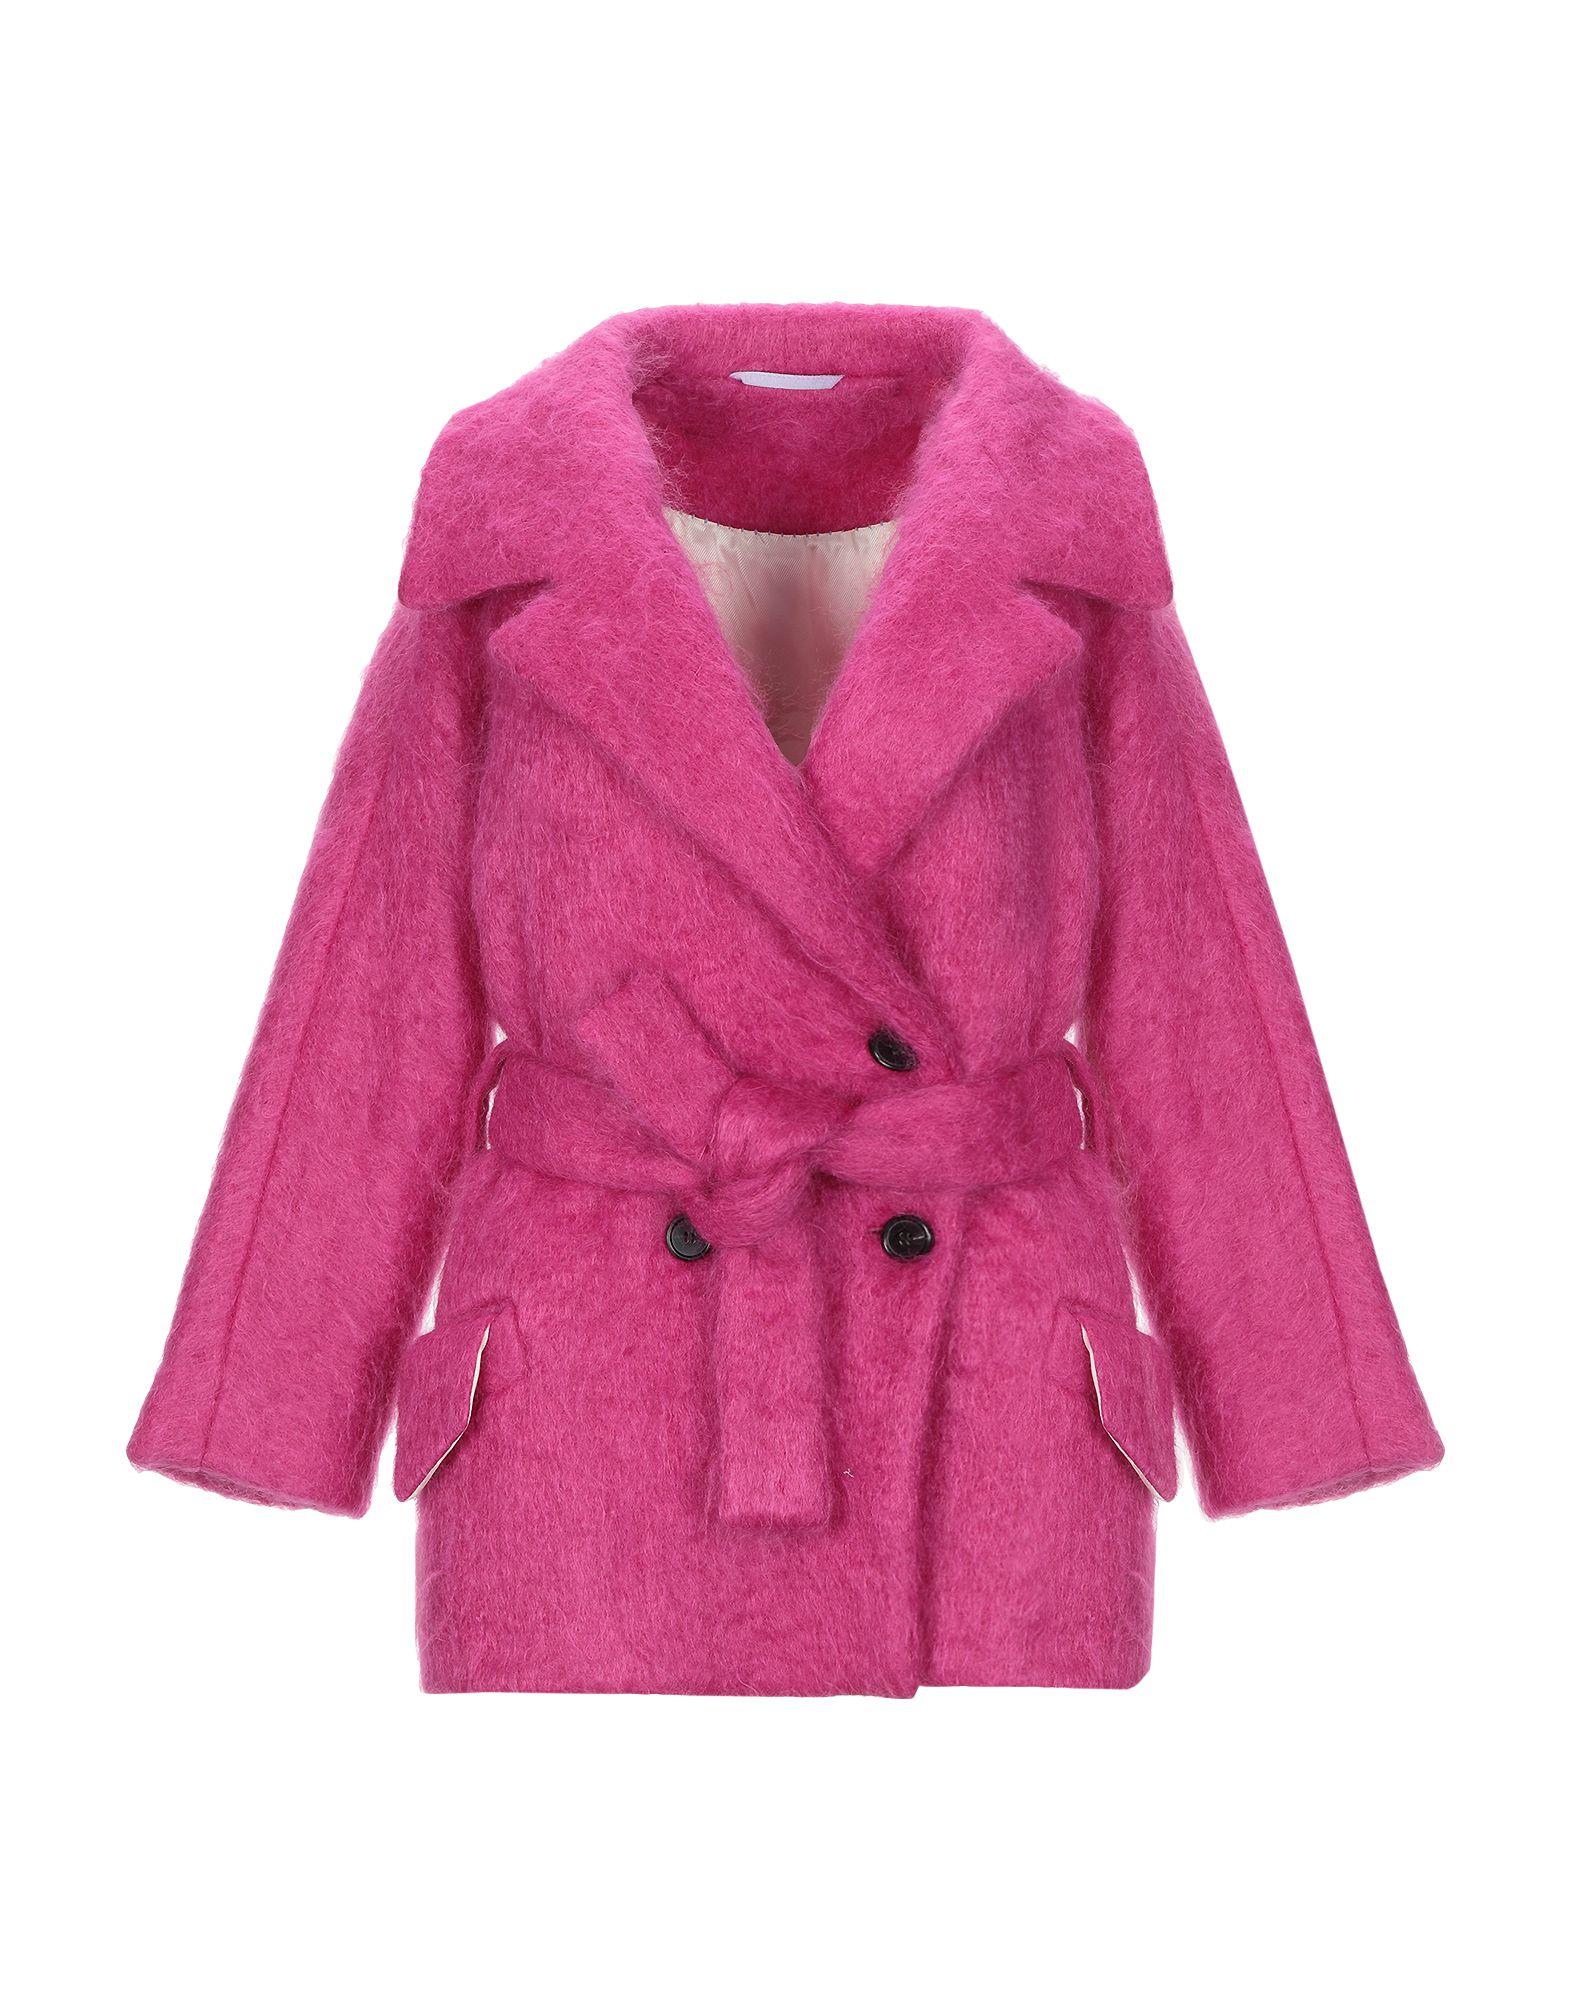 купить IL CAPPOTTINO Пальто дешево